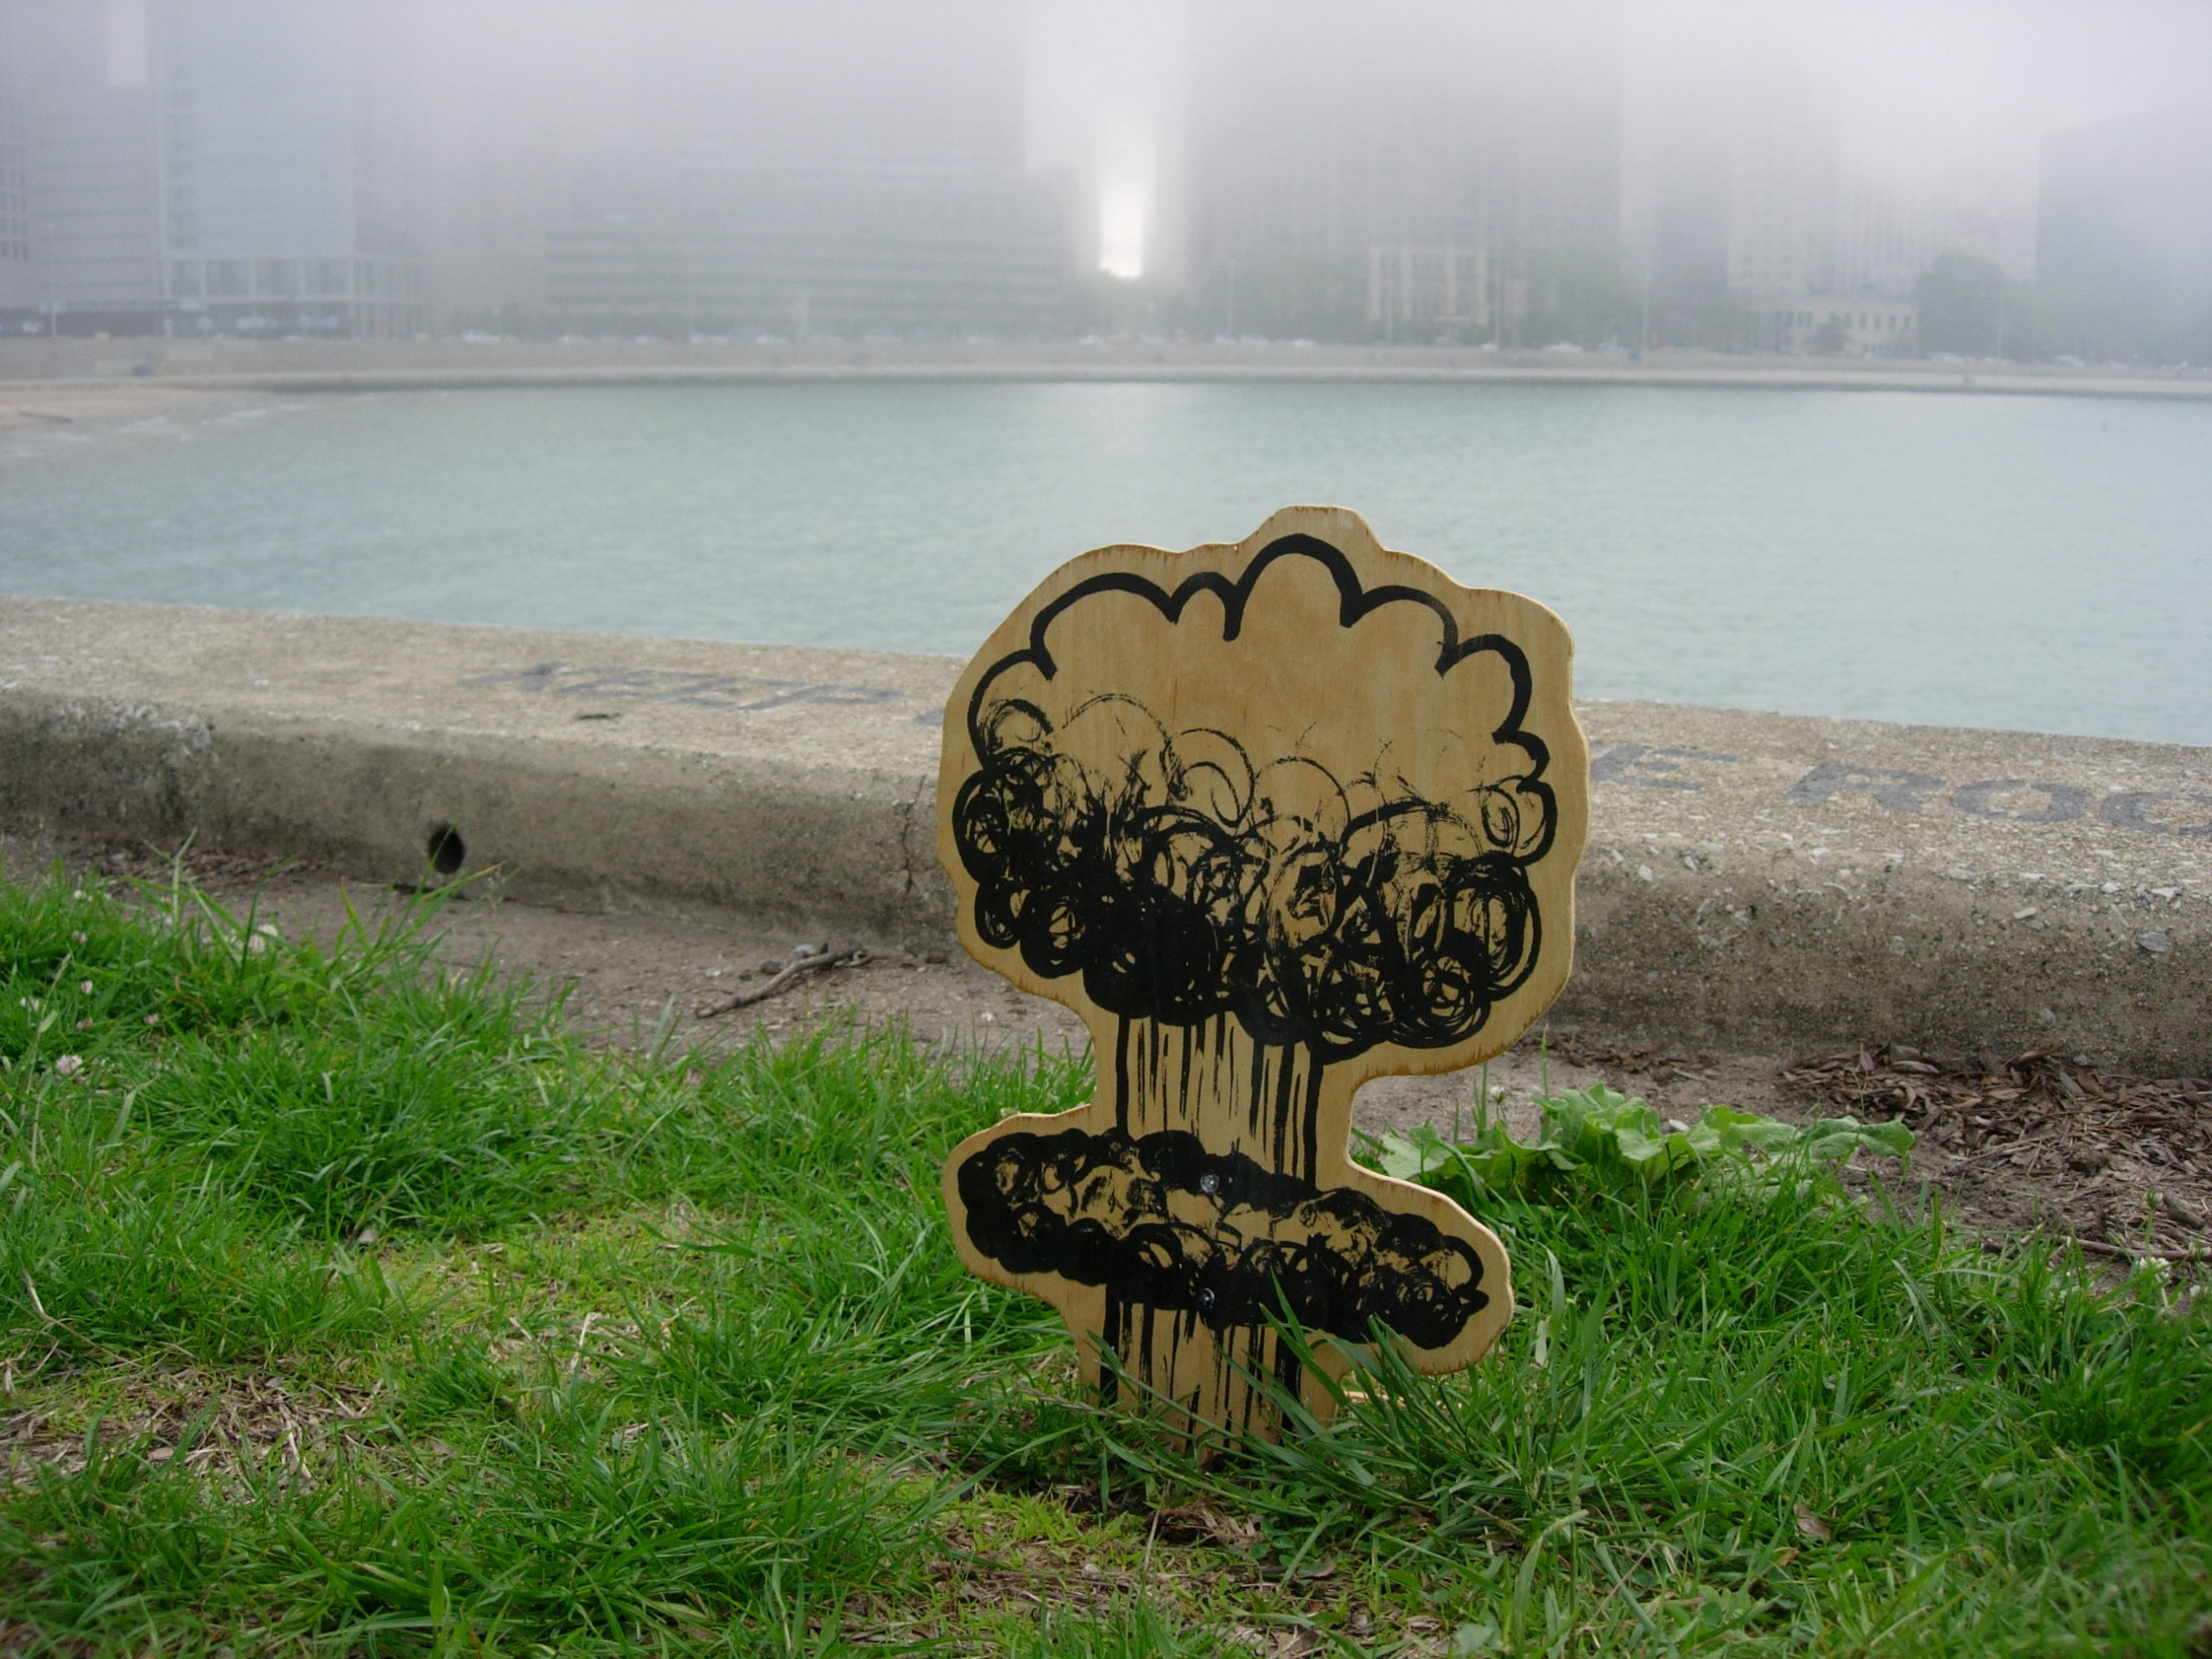 https://lisabulawsky.com/wp-content/uploads/2020/03/Chicago4-scaled.jpg